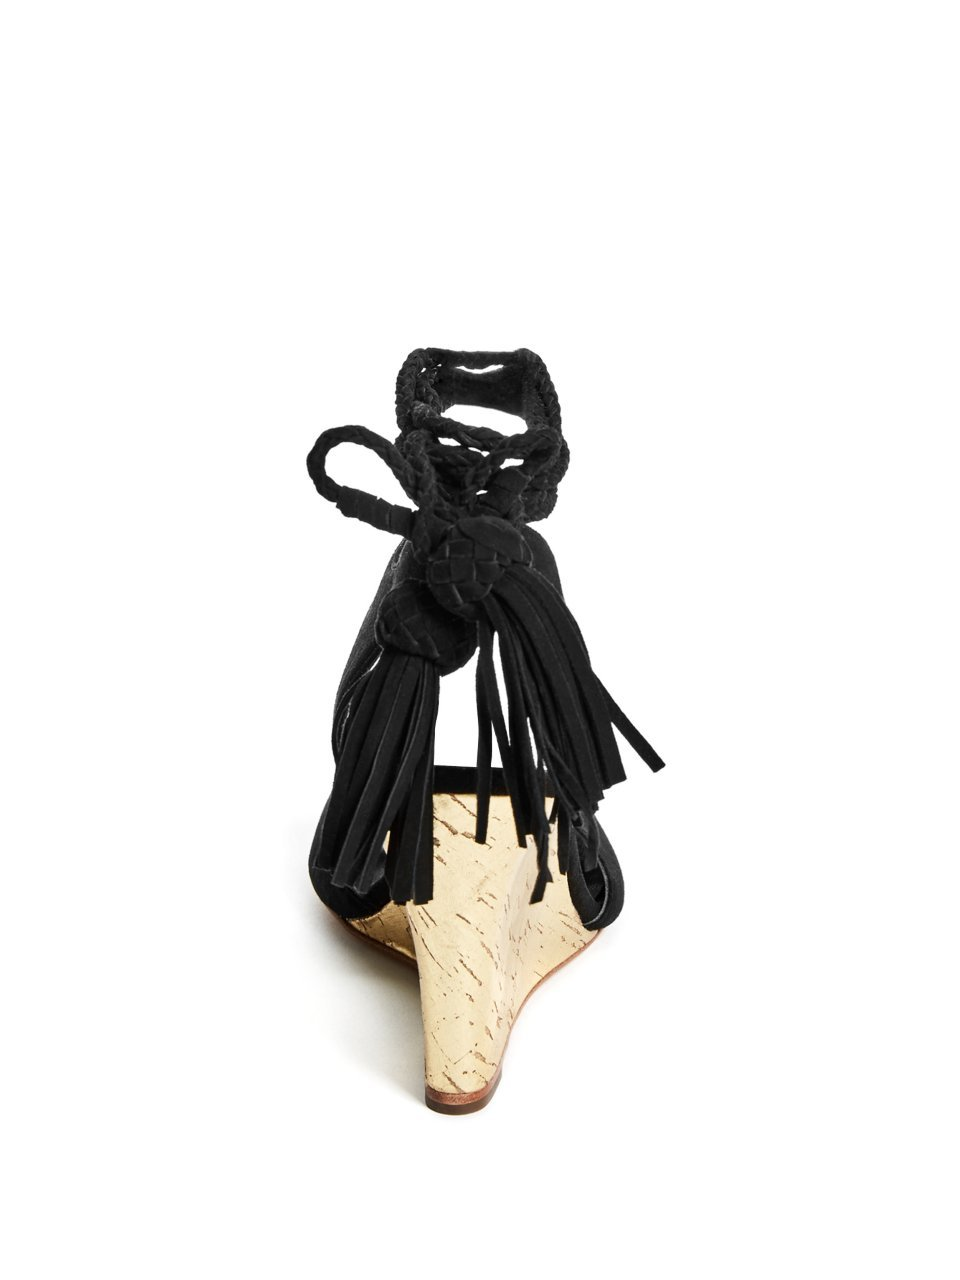 GUESS by Marciano Women's Riya Wedge B077NPYCJN 5.5 B(M) US|Black Multi Suede